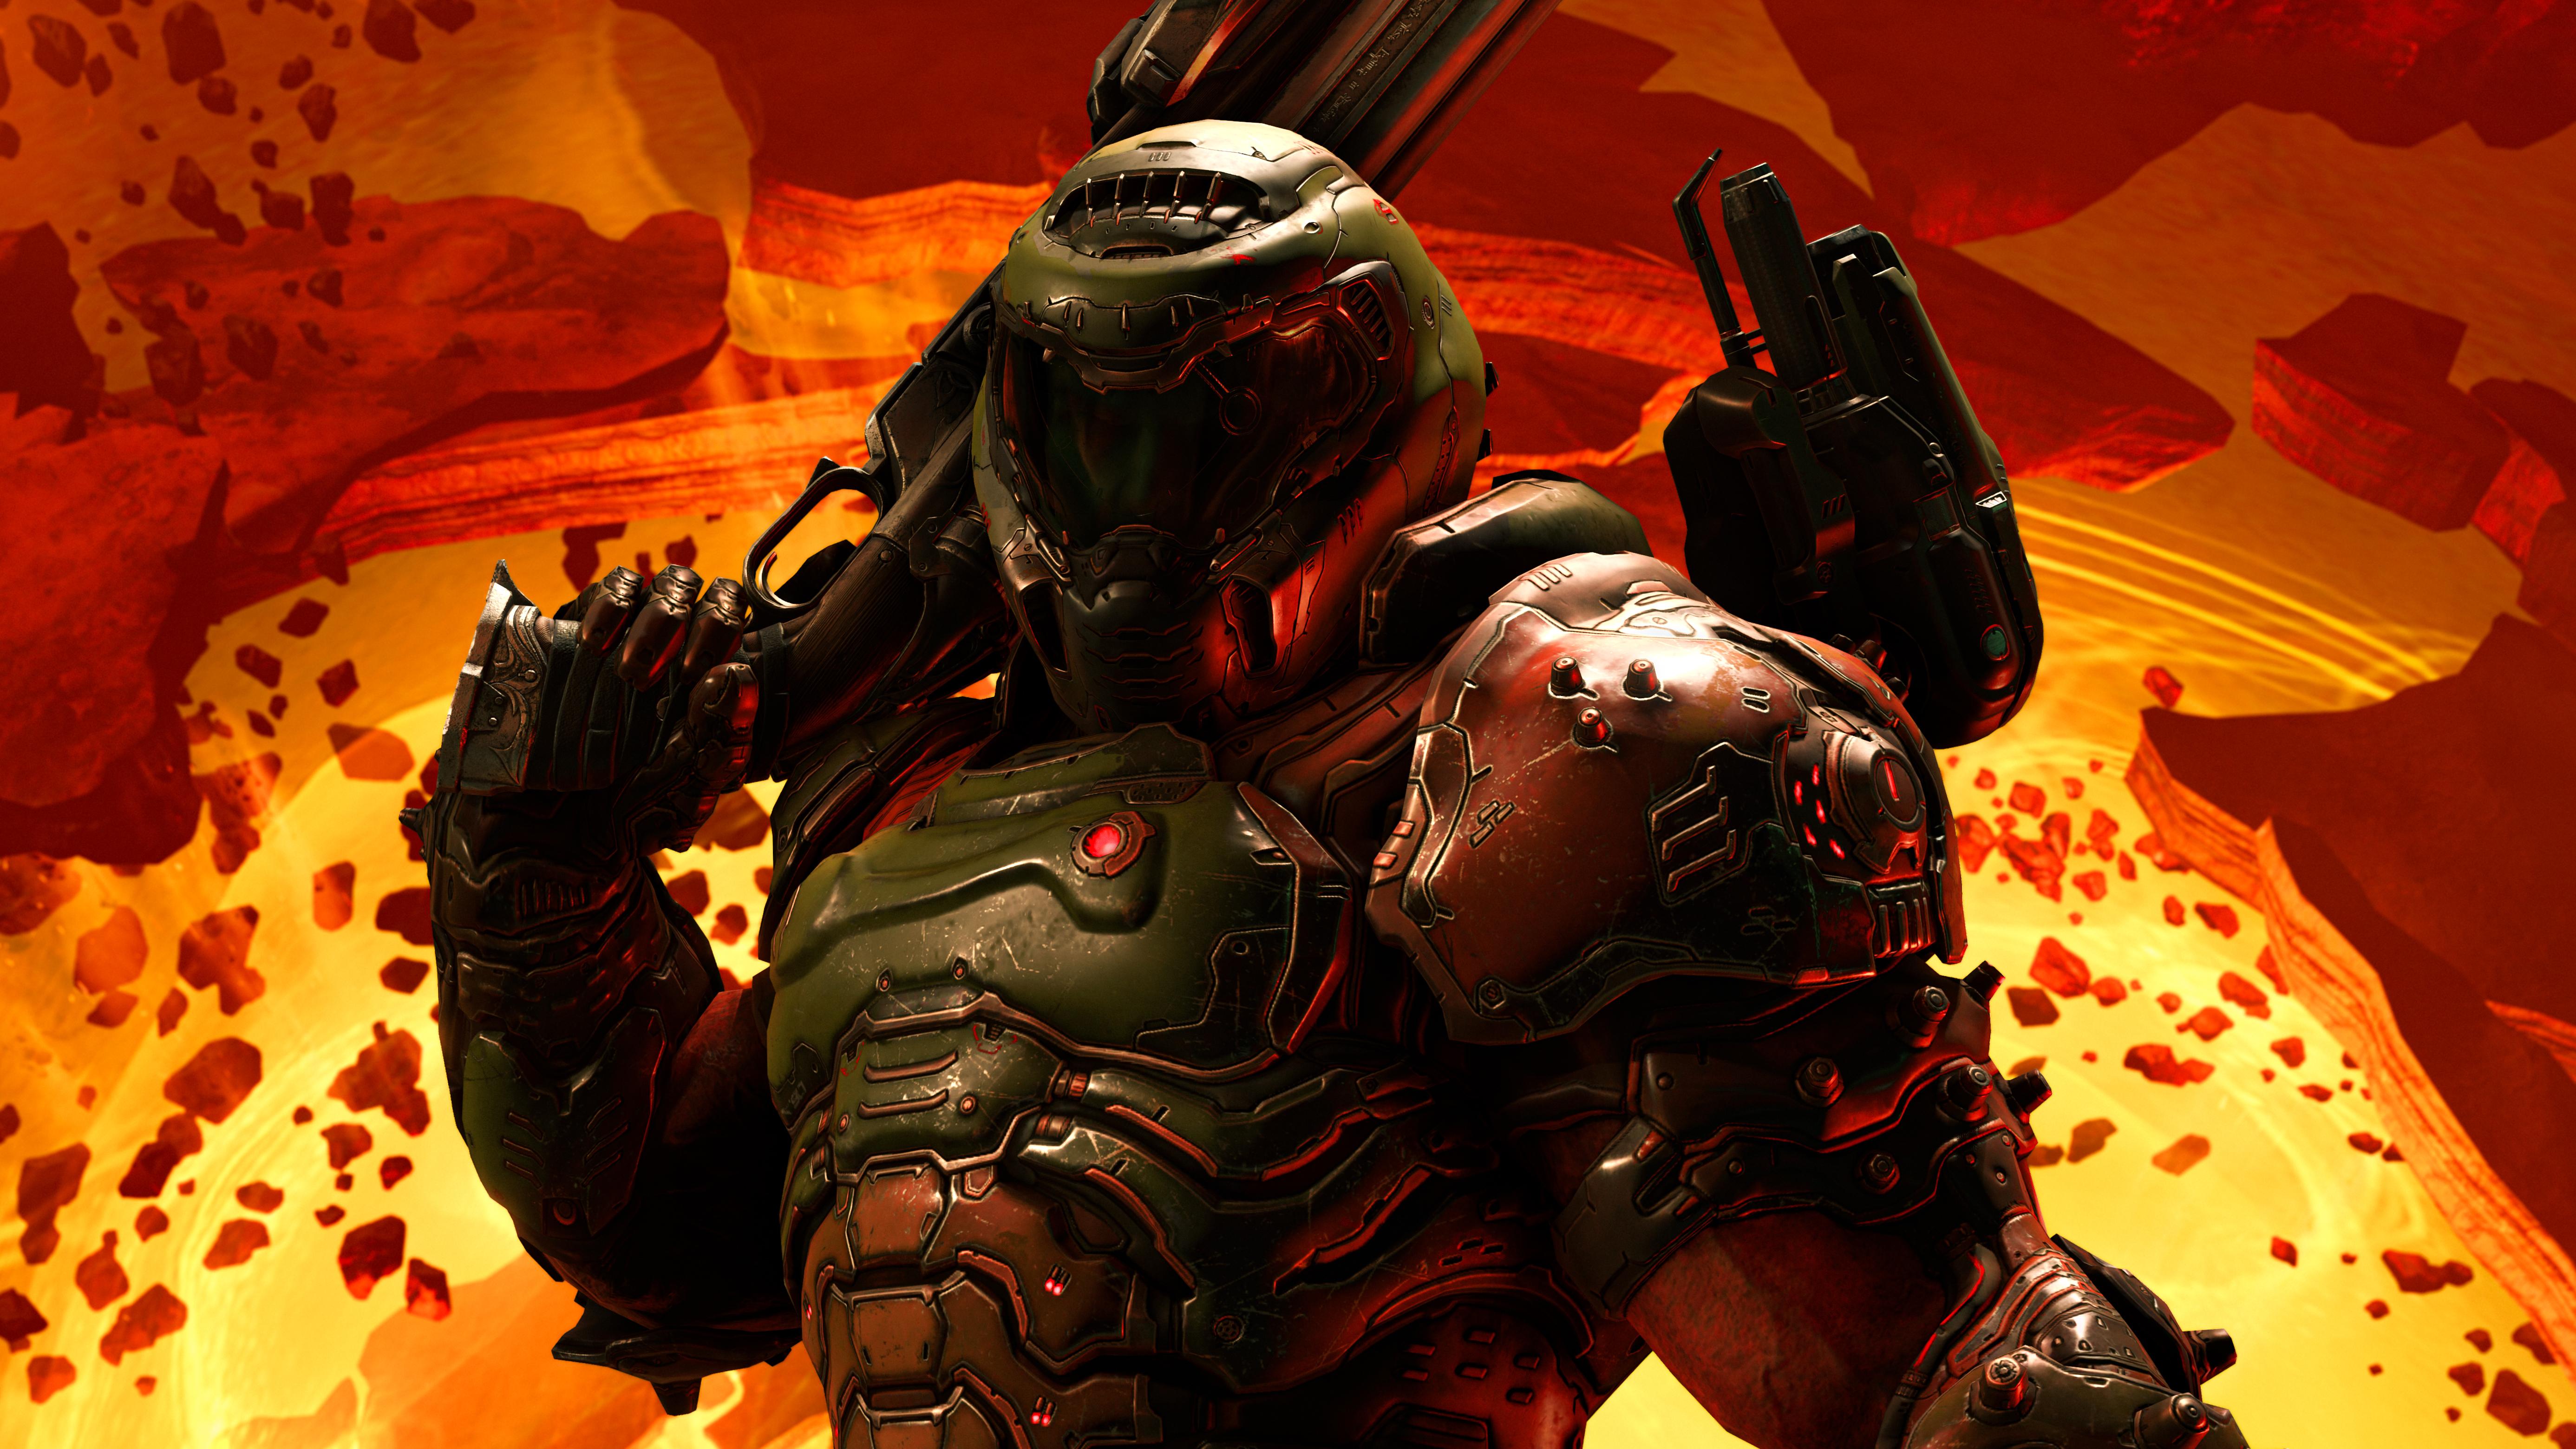 Doom Eternal 5k 2020, HD Games, 4k Wallpapers, Images ...